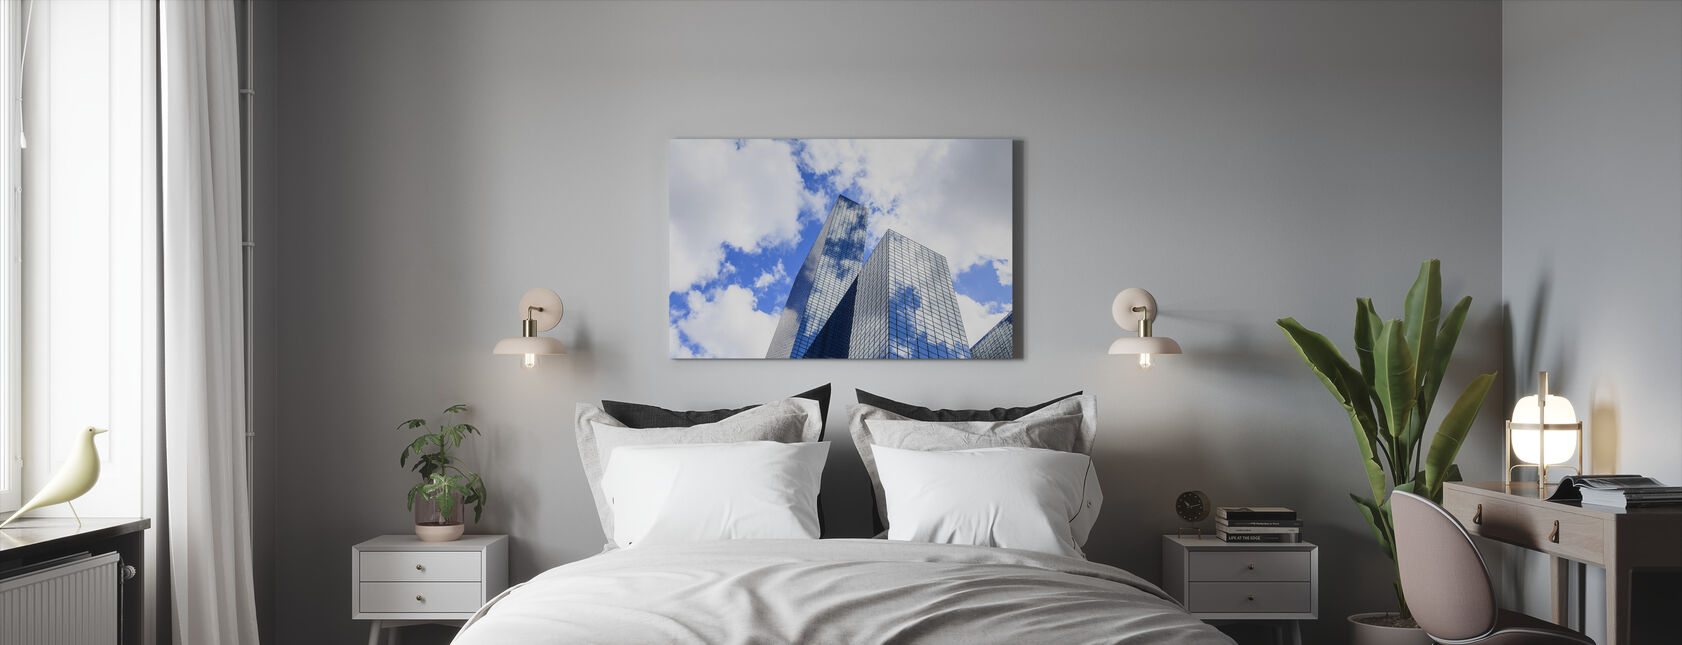 Pilvet heijastuvat moderni lasi julkisivu - Canvastaulu - Makuuhuone